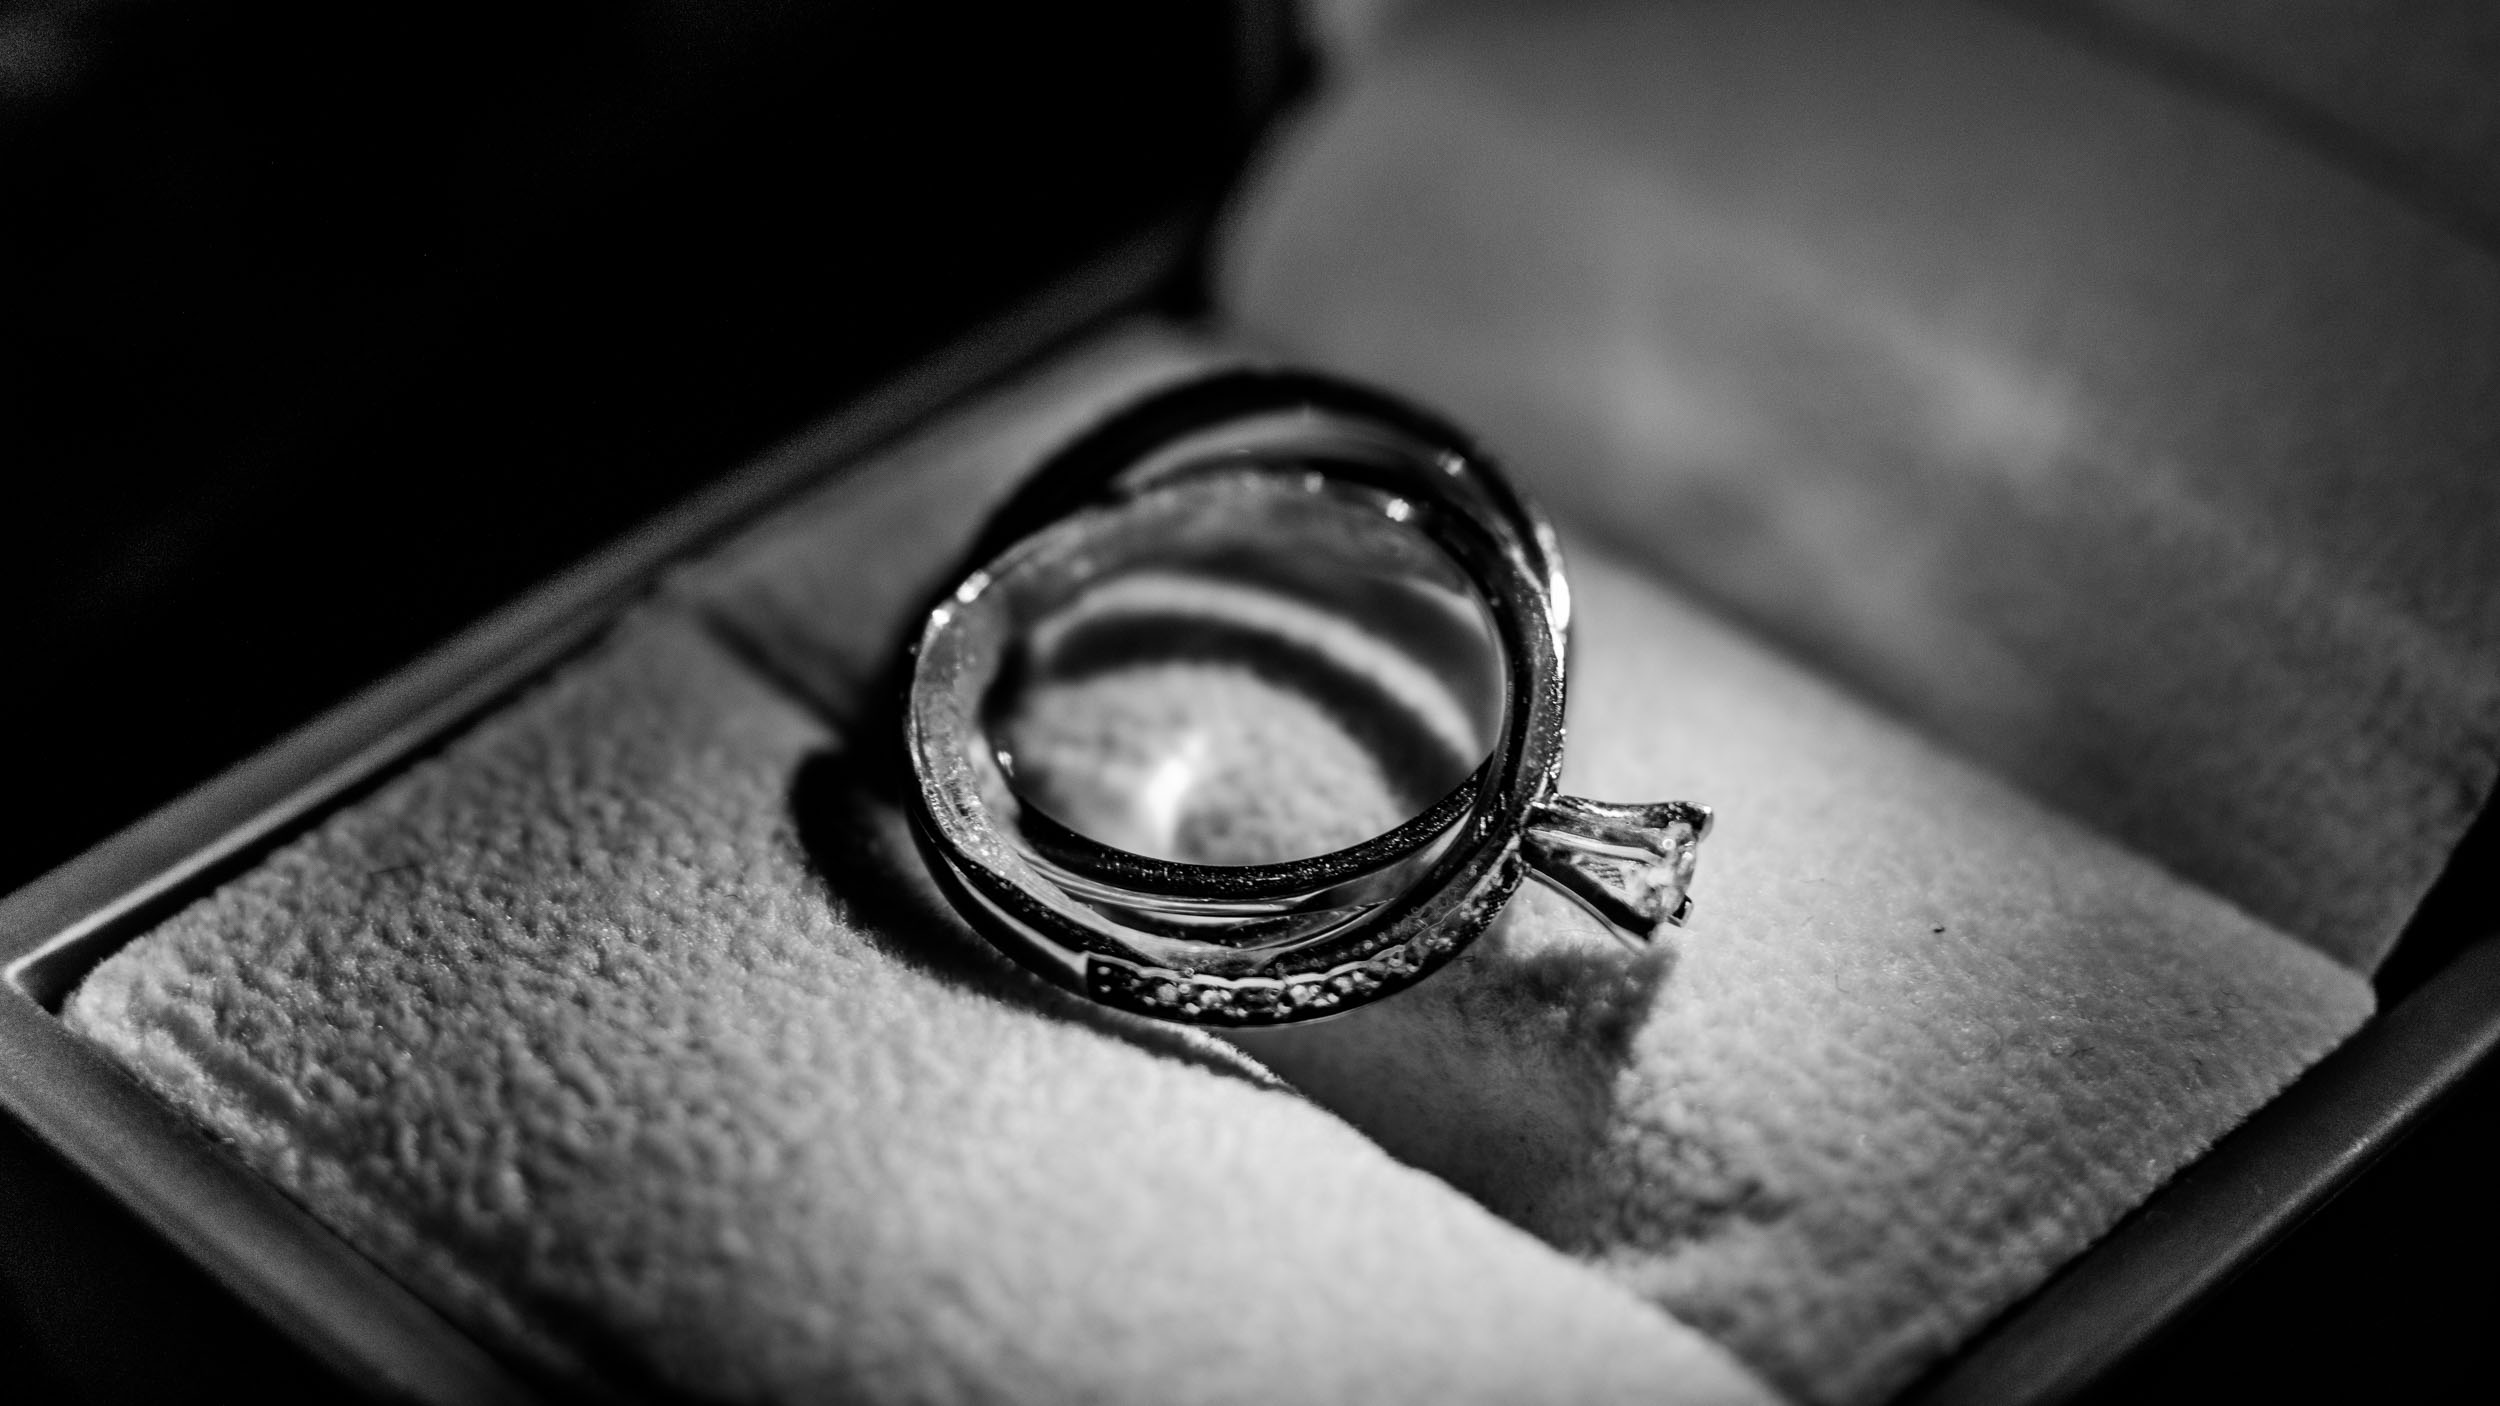 dc+metro+wedding+photographer+vadym+guliuk+photography+wedding+rings-2027.jpg